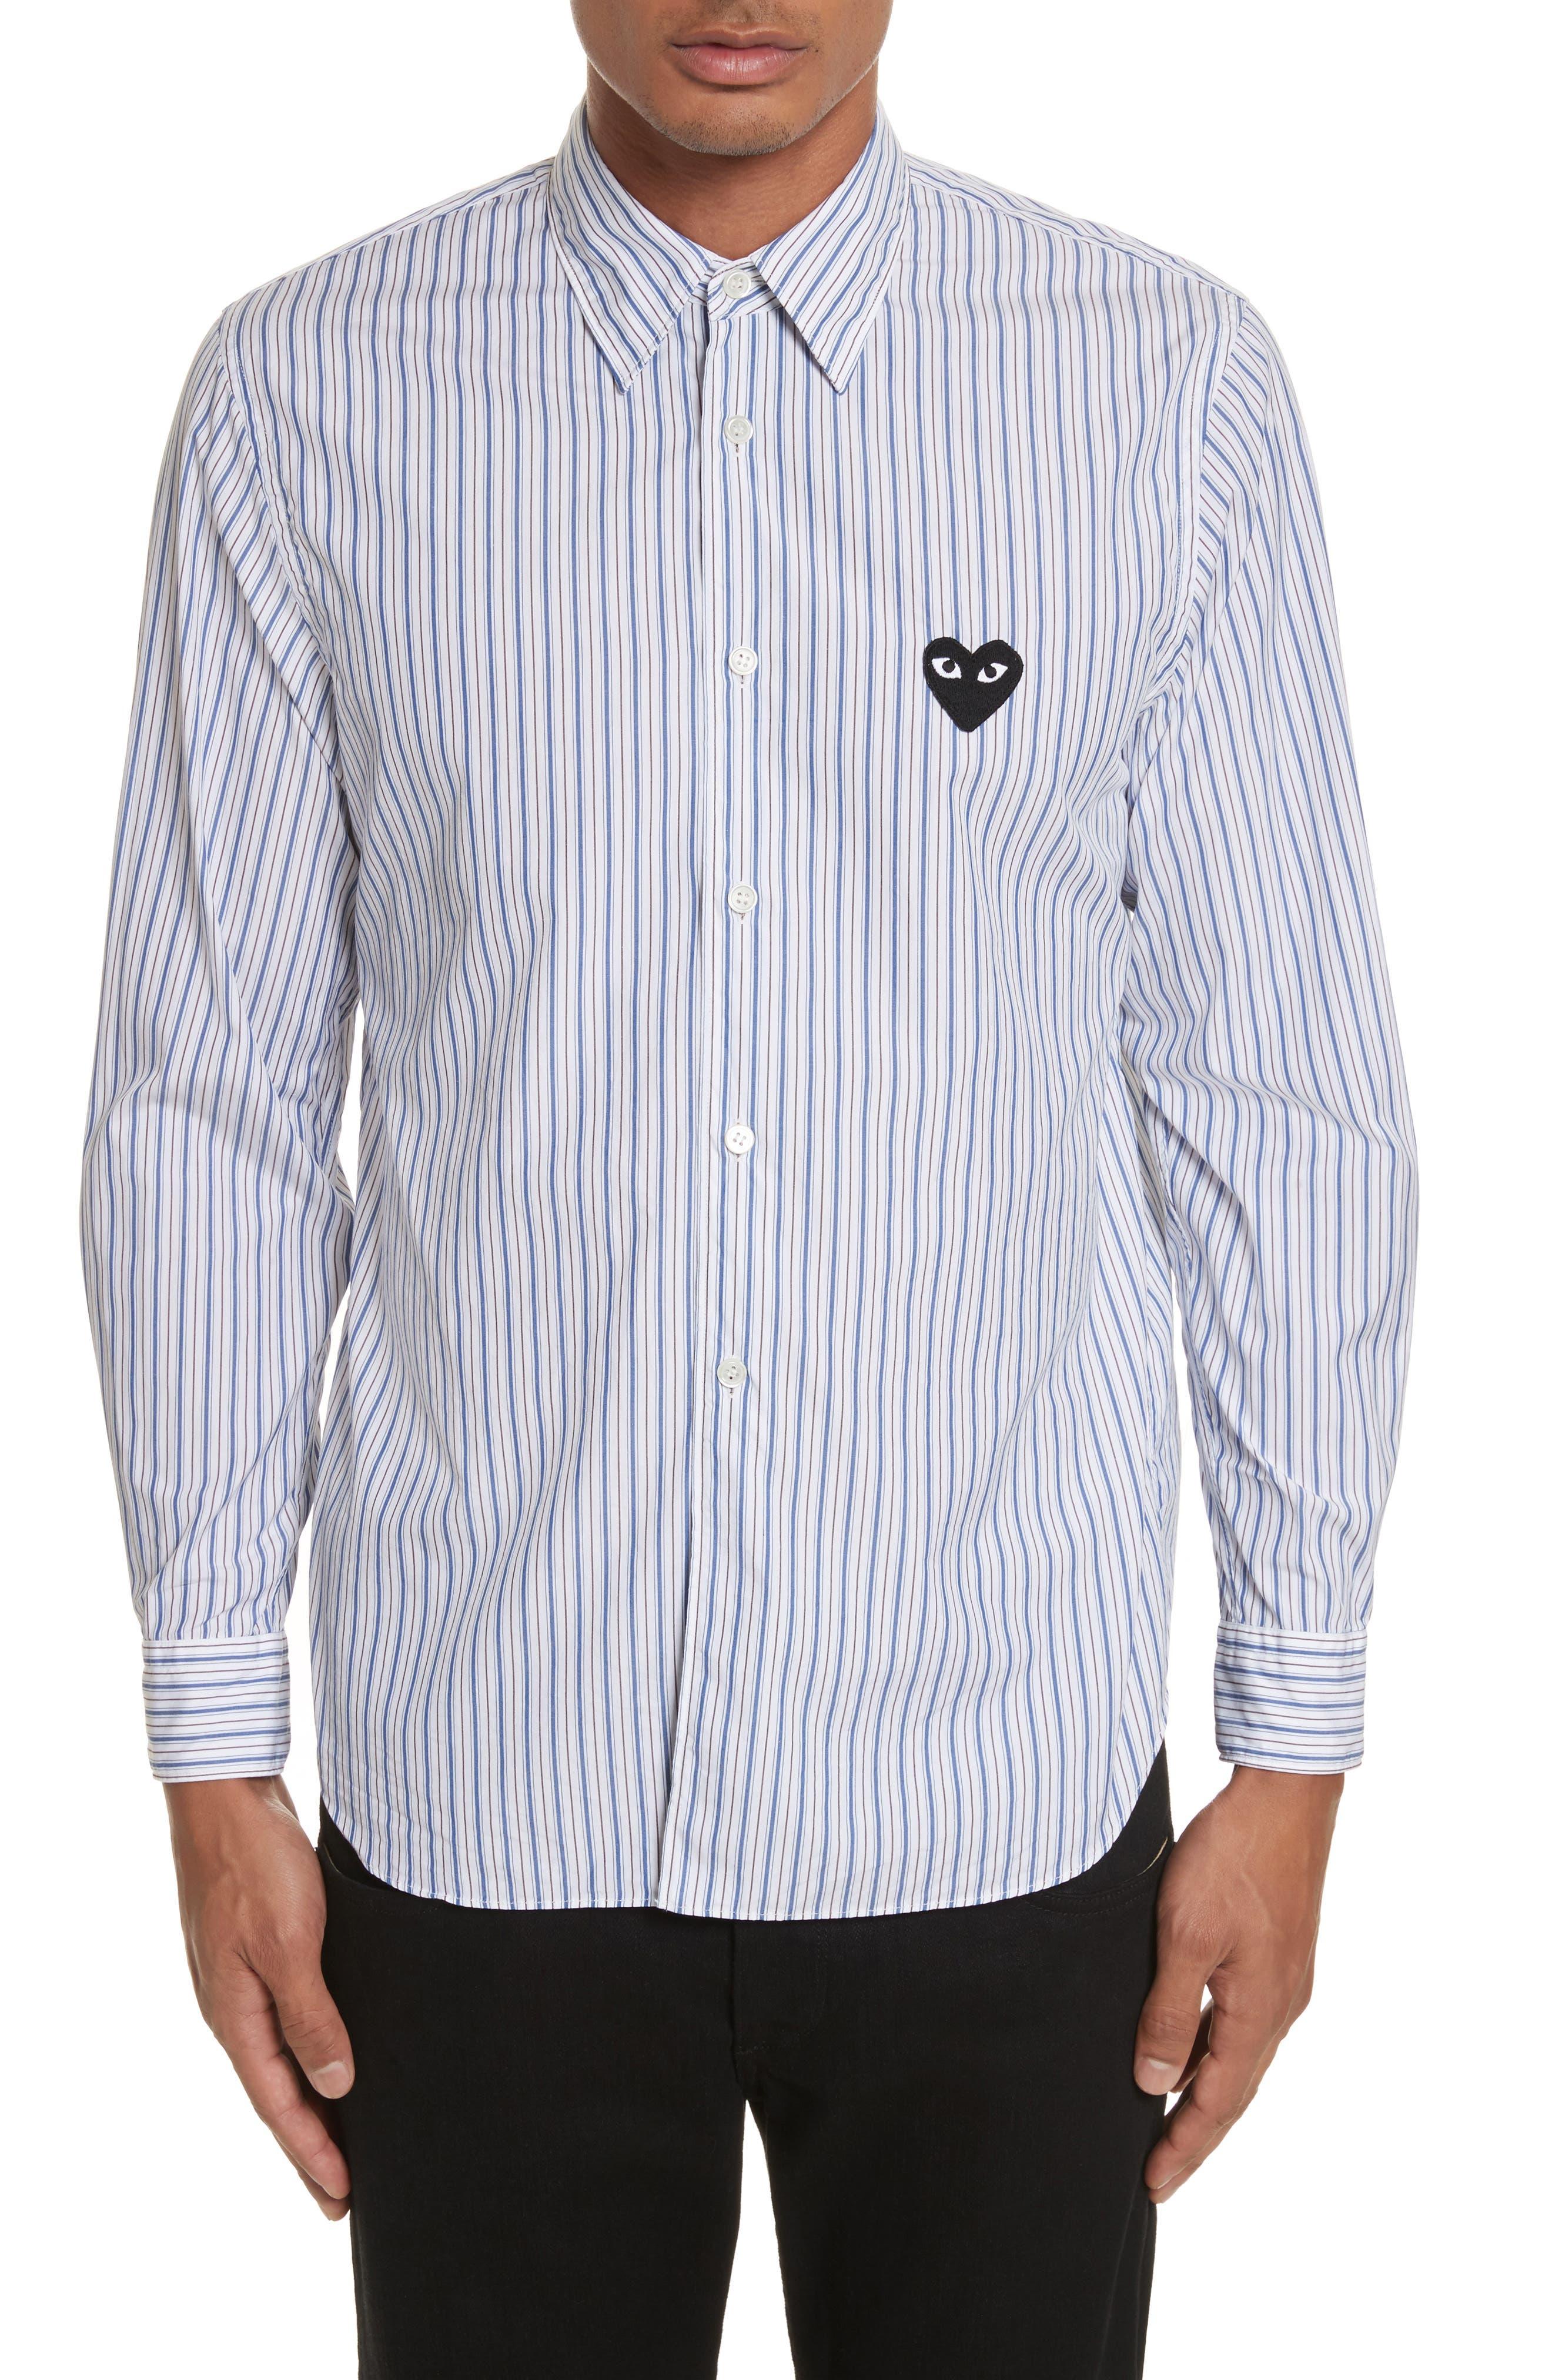 Comme des Garçons PLAY Black Heart Stripe Oxford Shirt